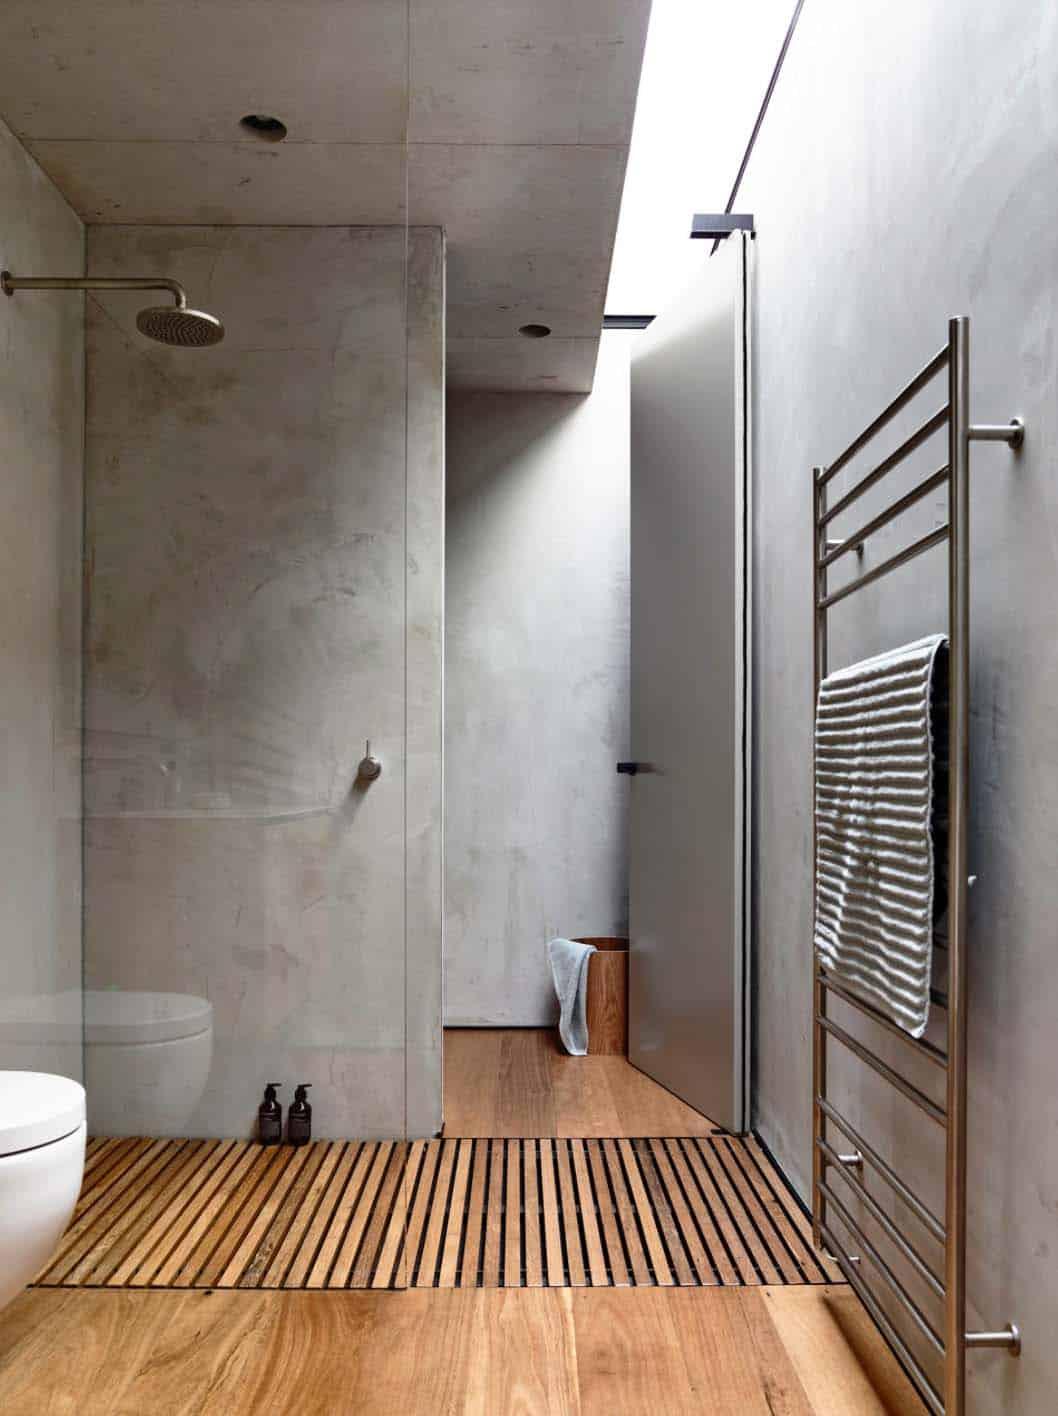 Concrete bathroom